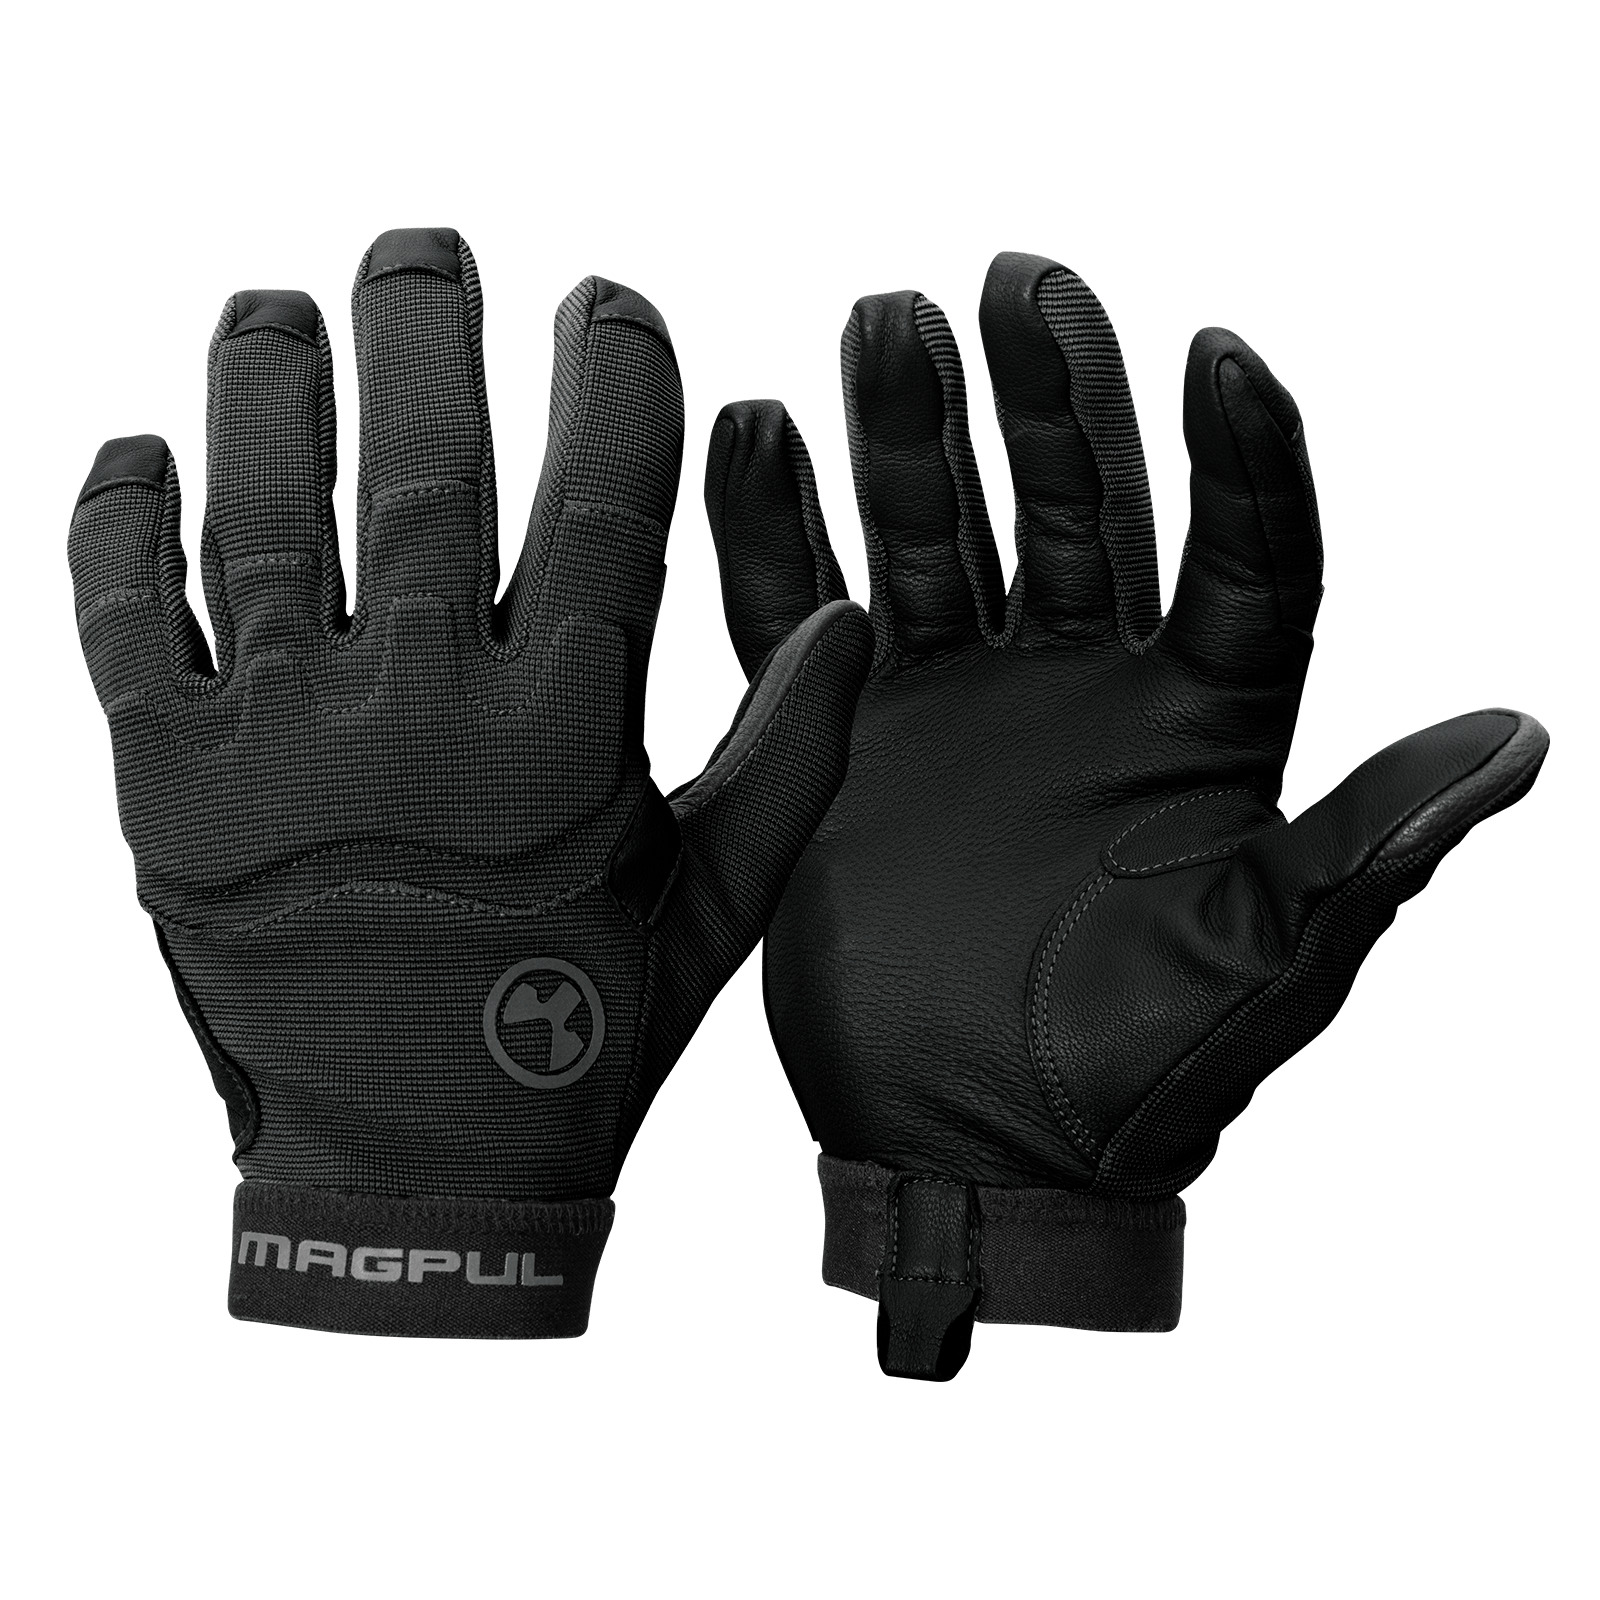 Magpul MAG1015-001 Patrol Glove 2.0 XL Black